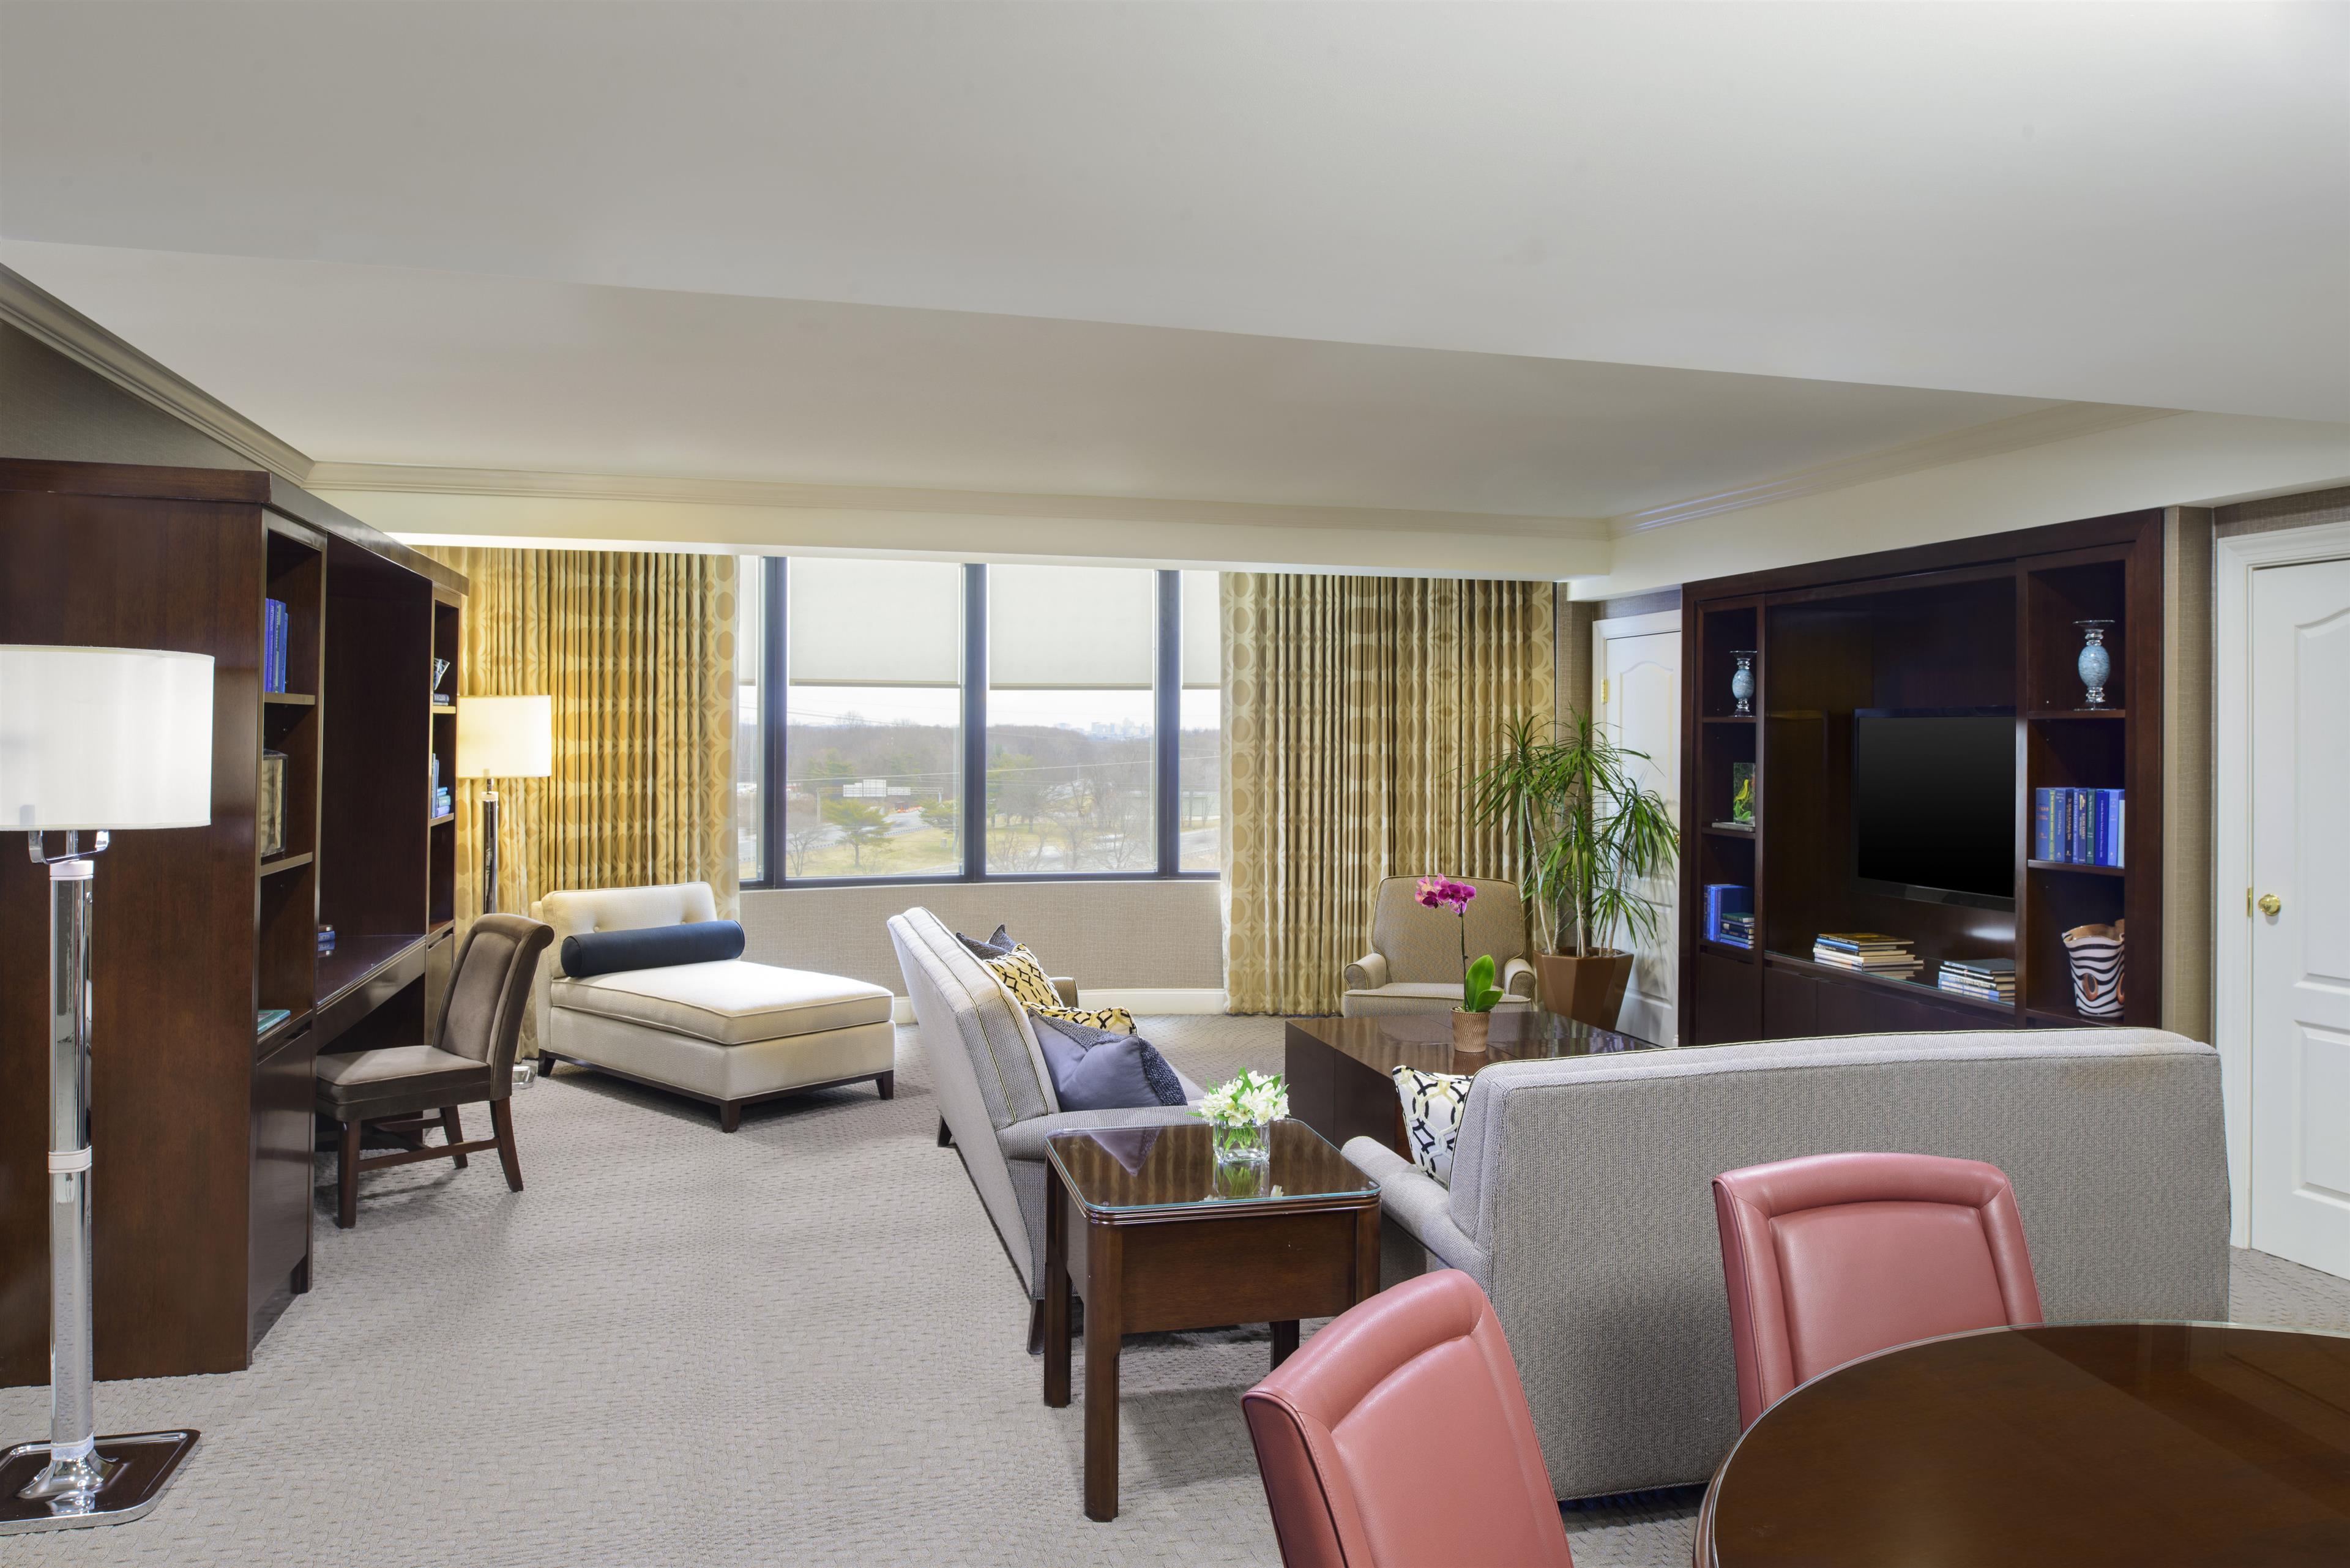 Sheraton Wilmington South Hotel image 3